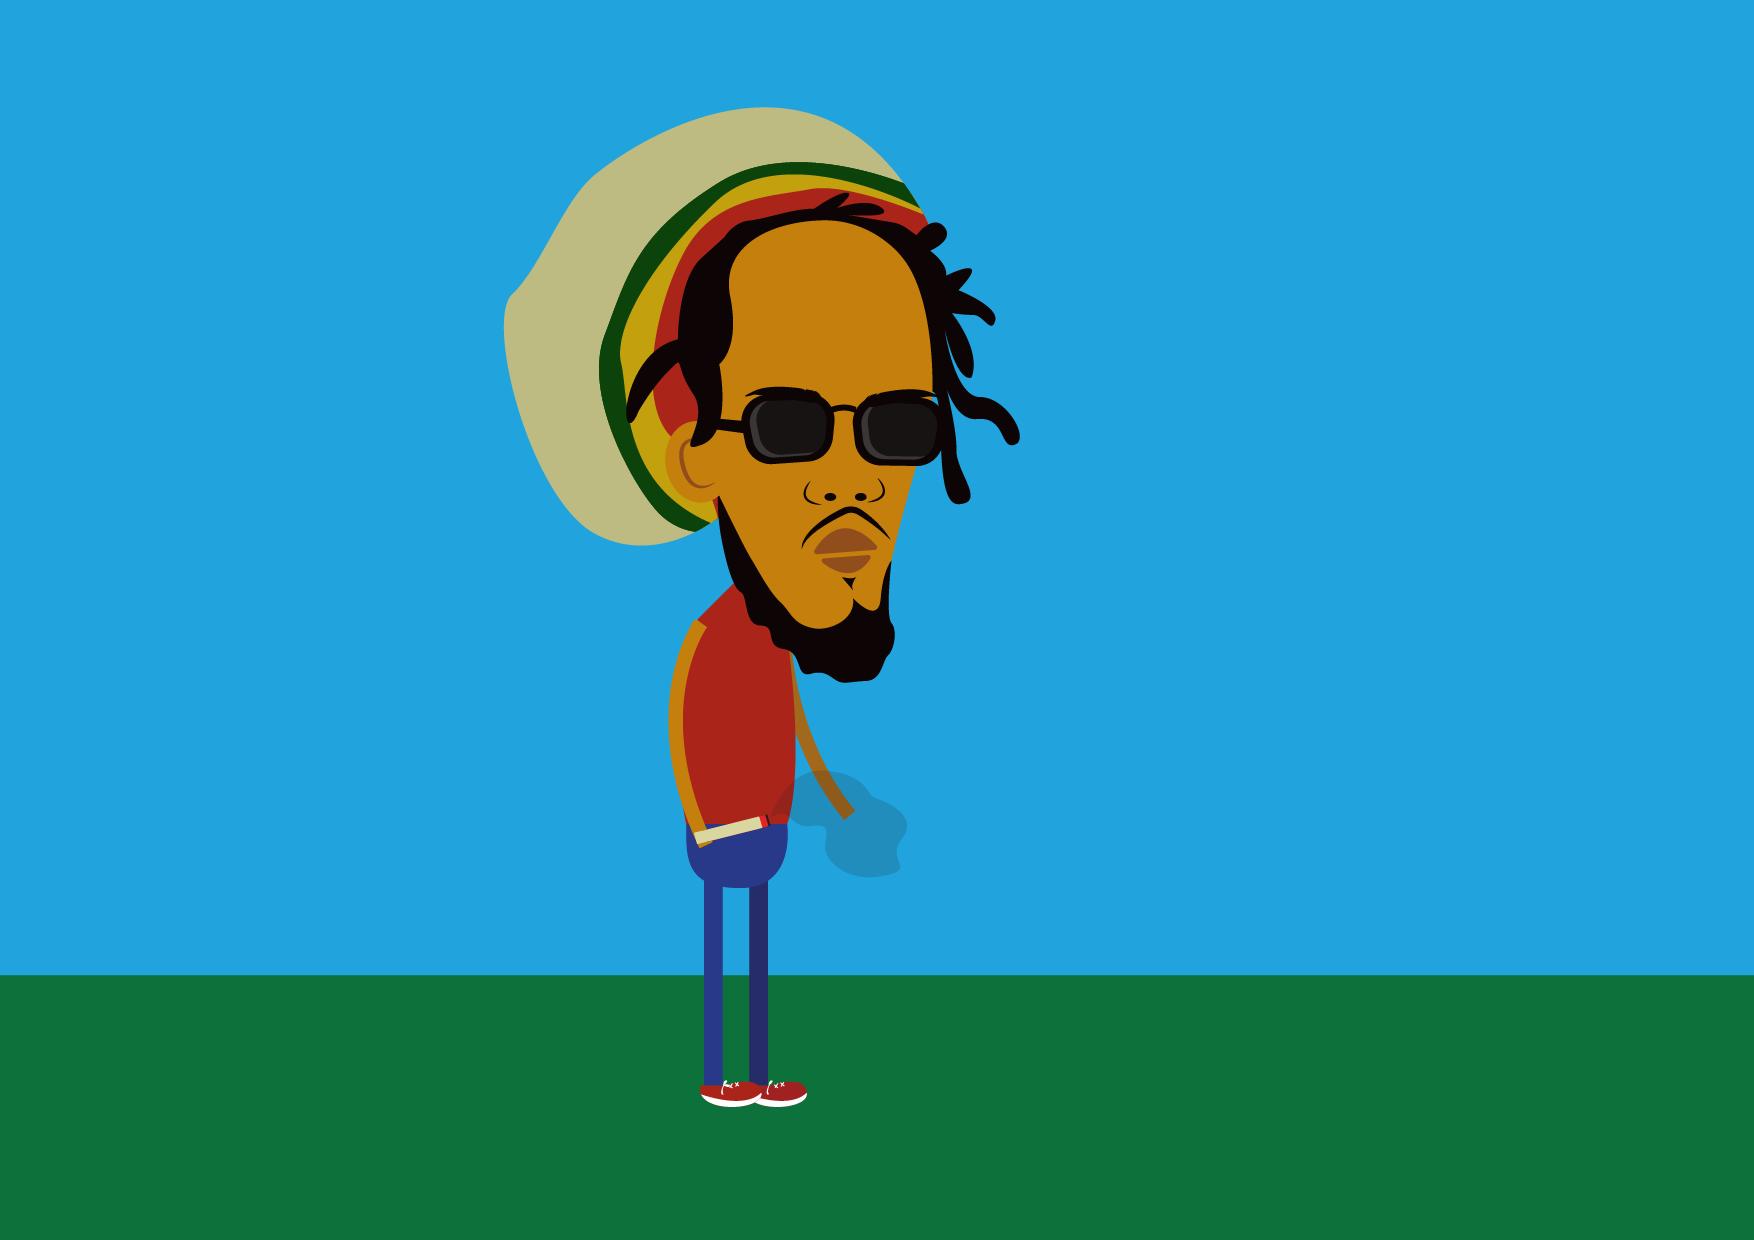 Walking Bob Marley Skillshare Projects